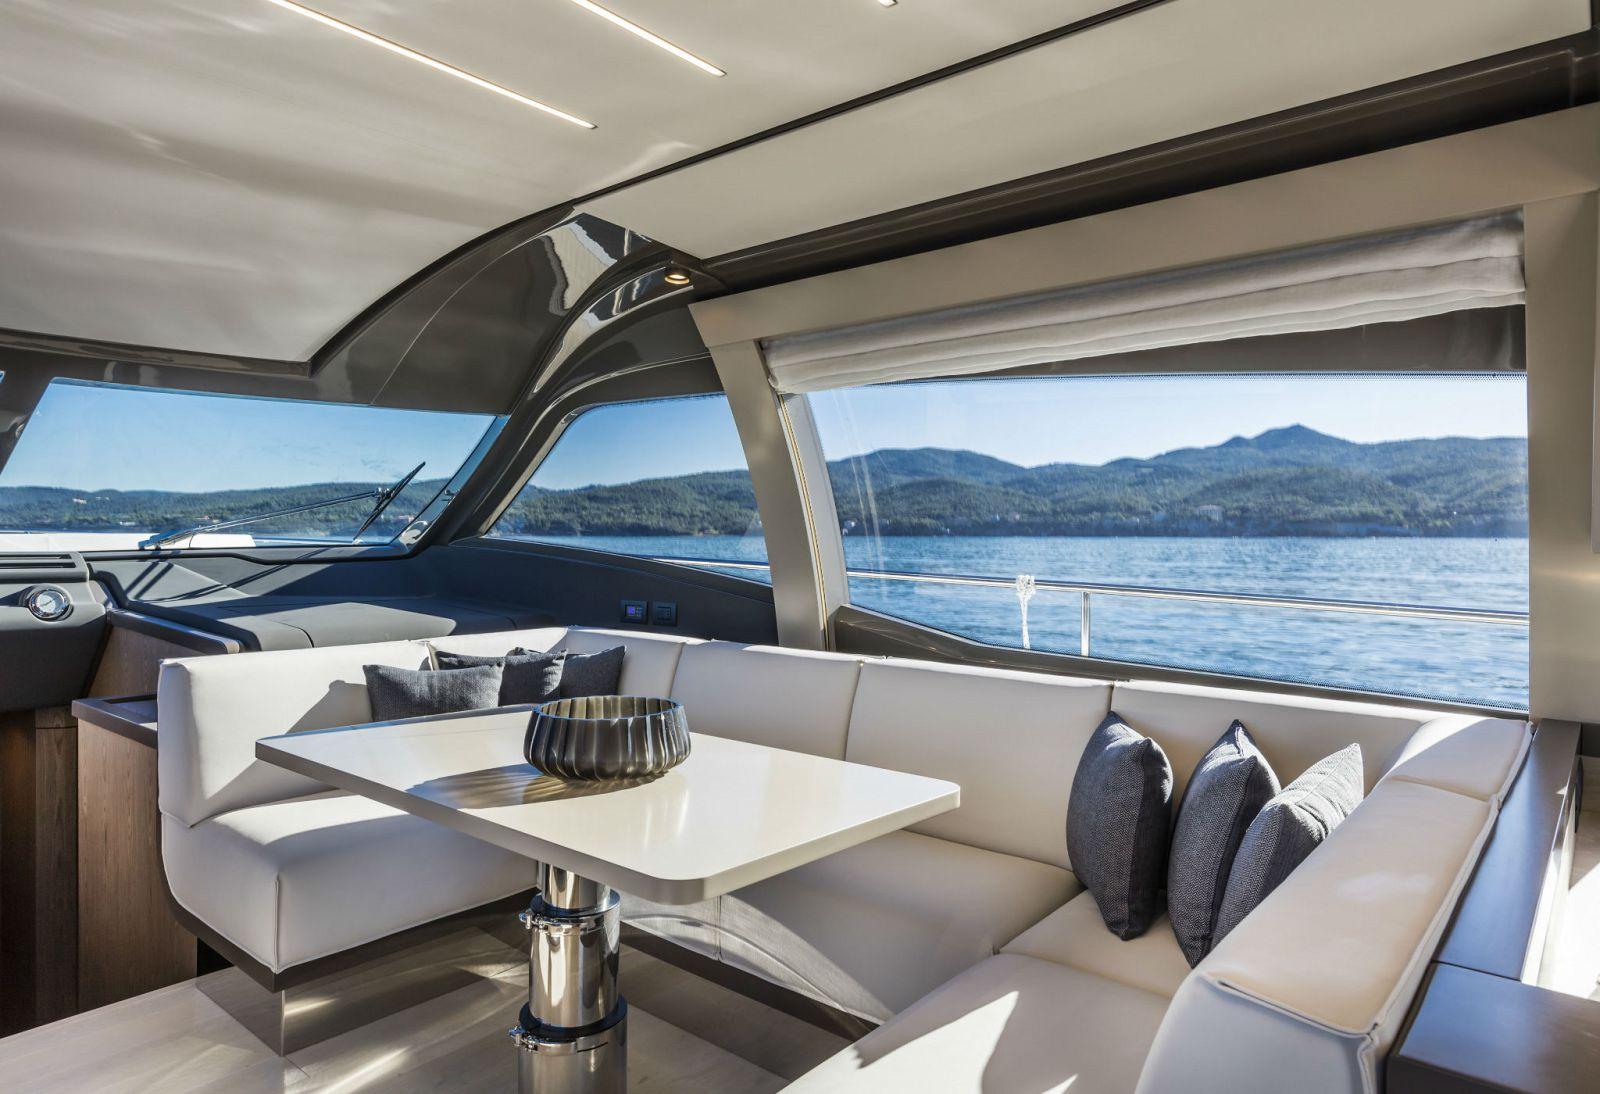 Ferretti Yachts 550 Salon - New Luxury Yacht for Sale >